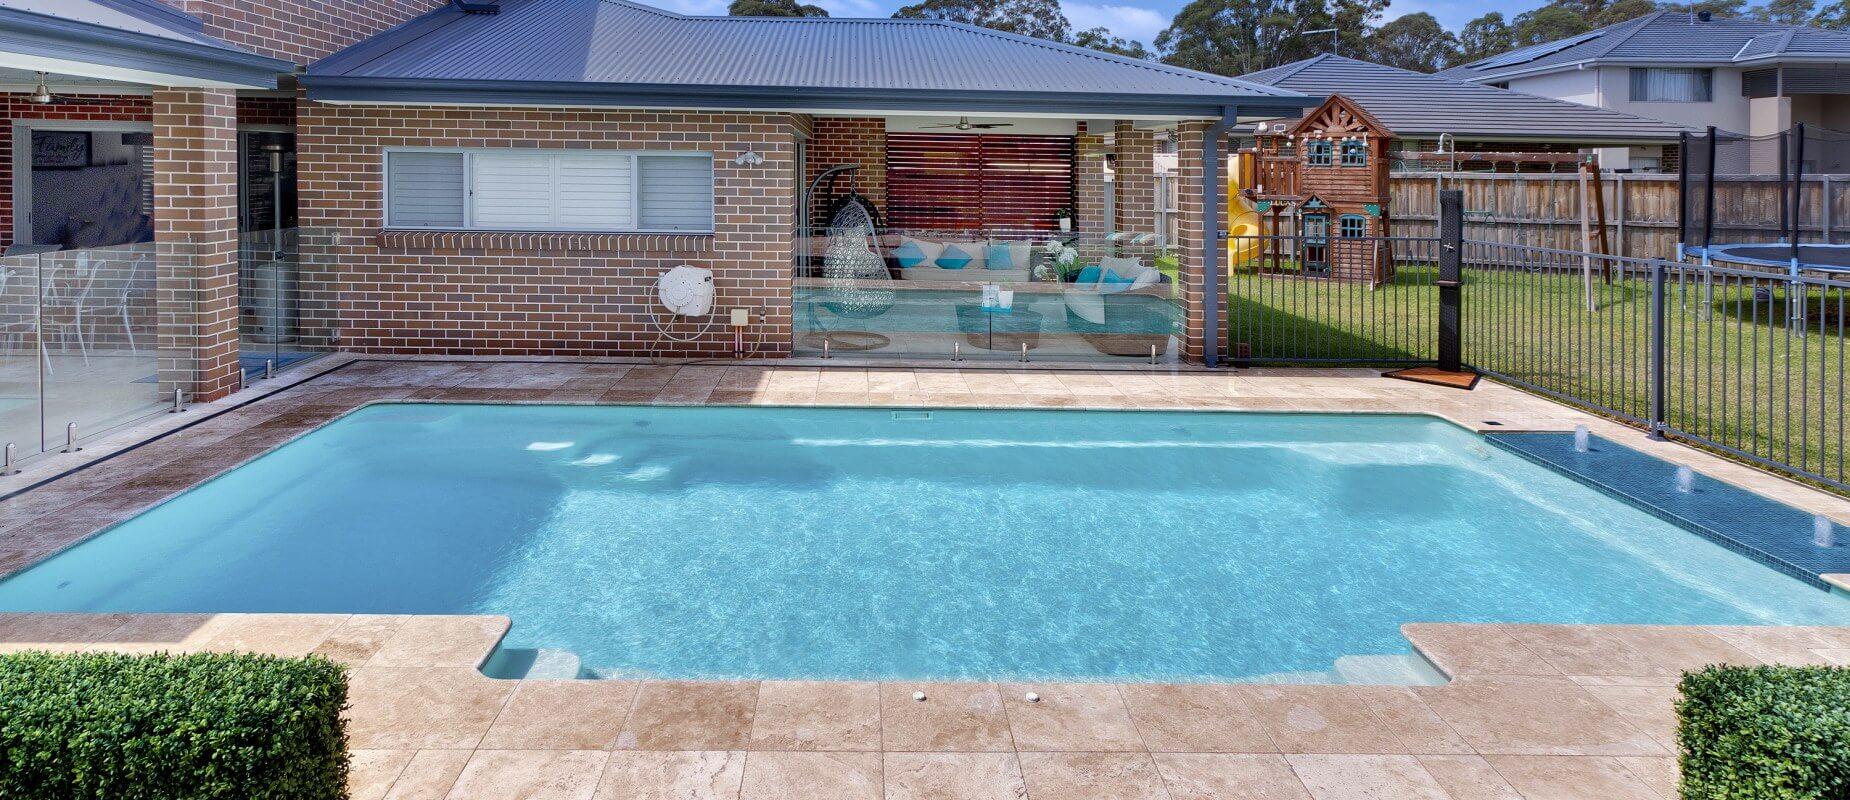 piscina de lux modele frumoase 47